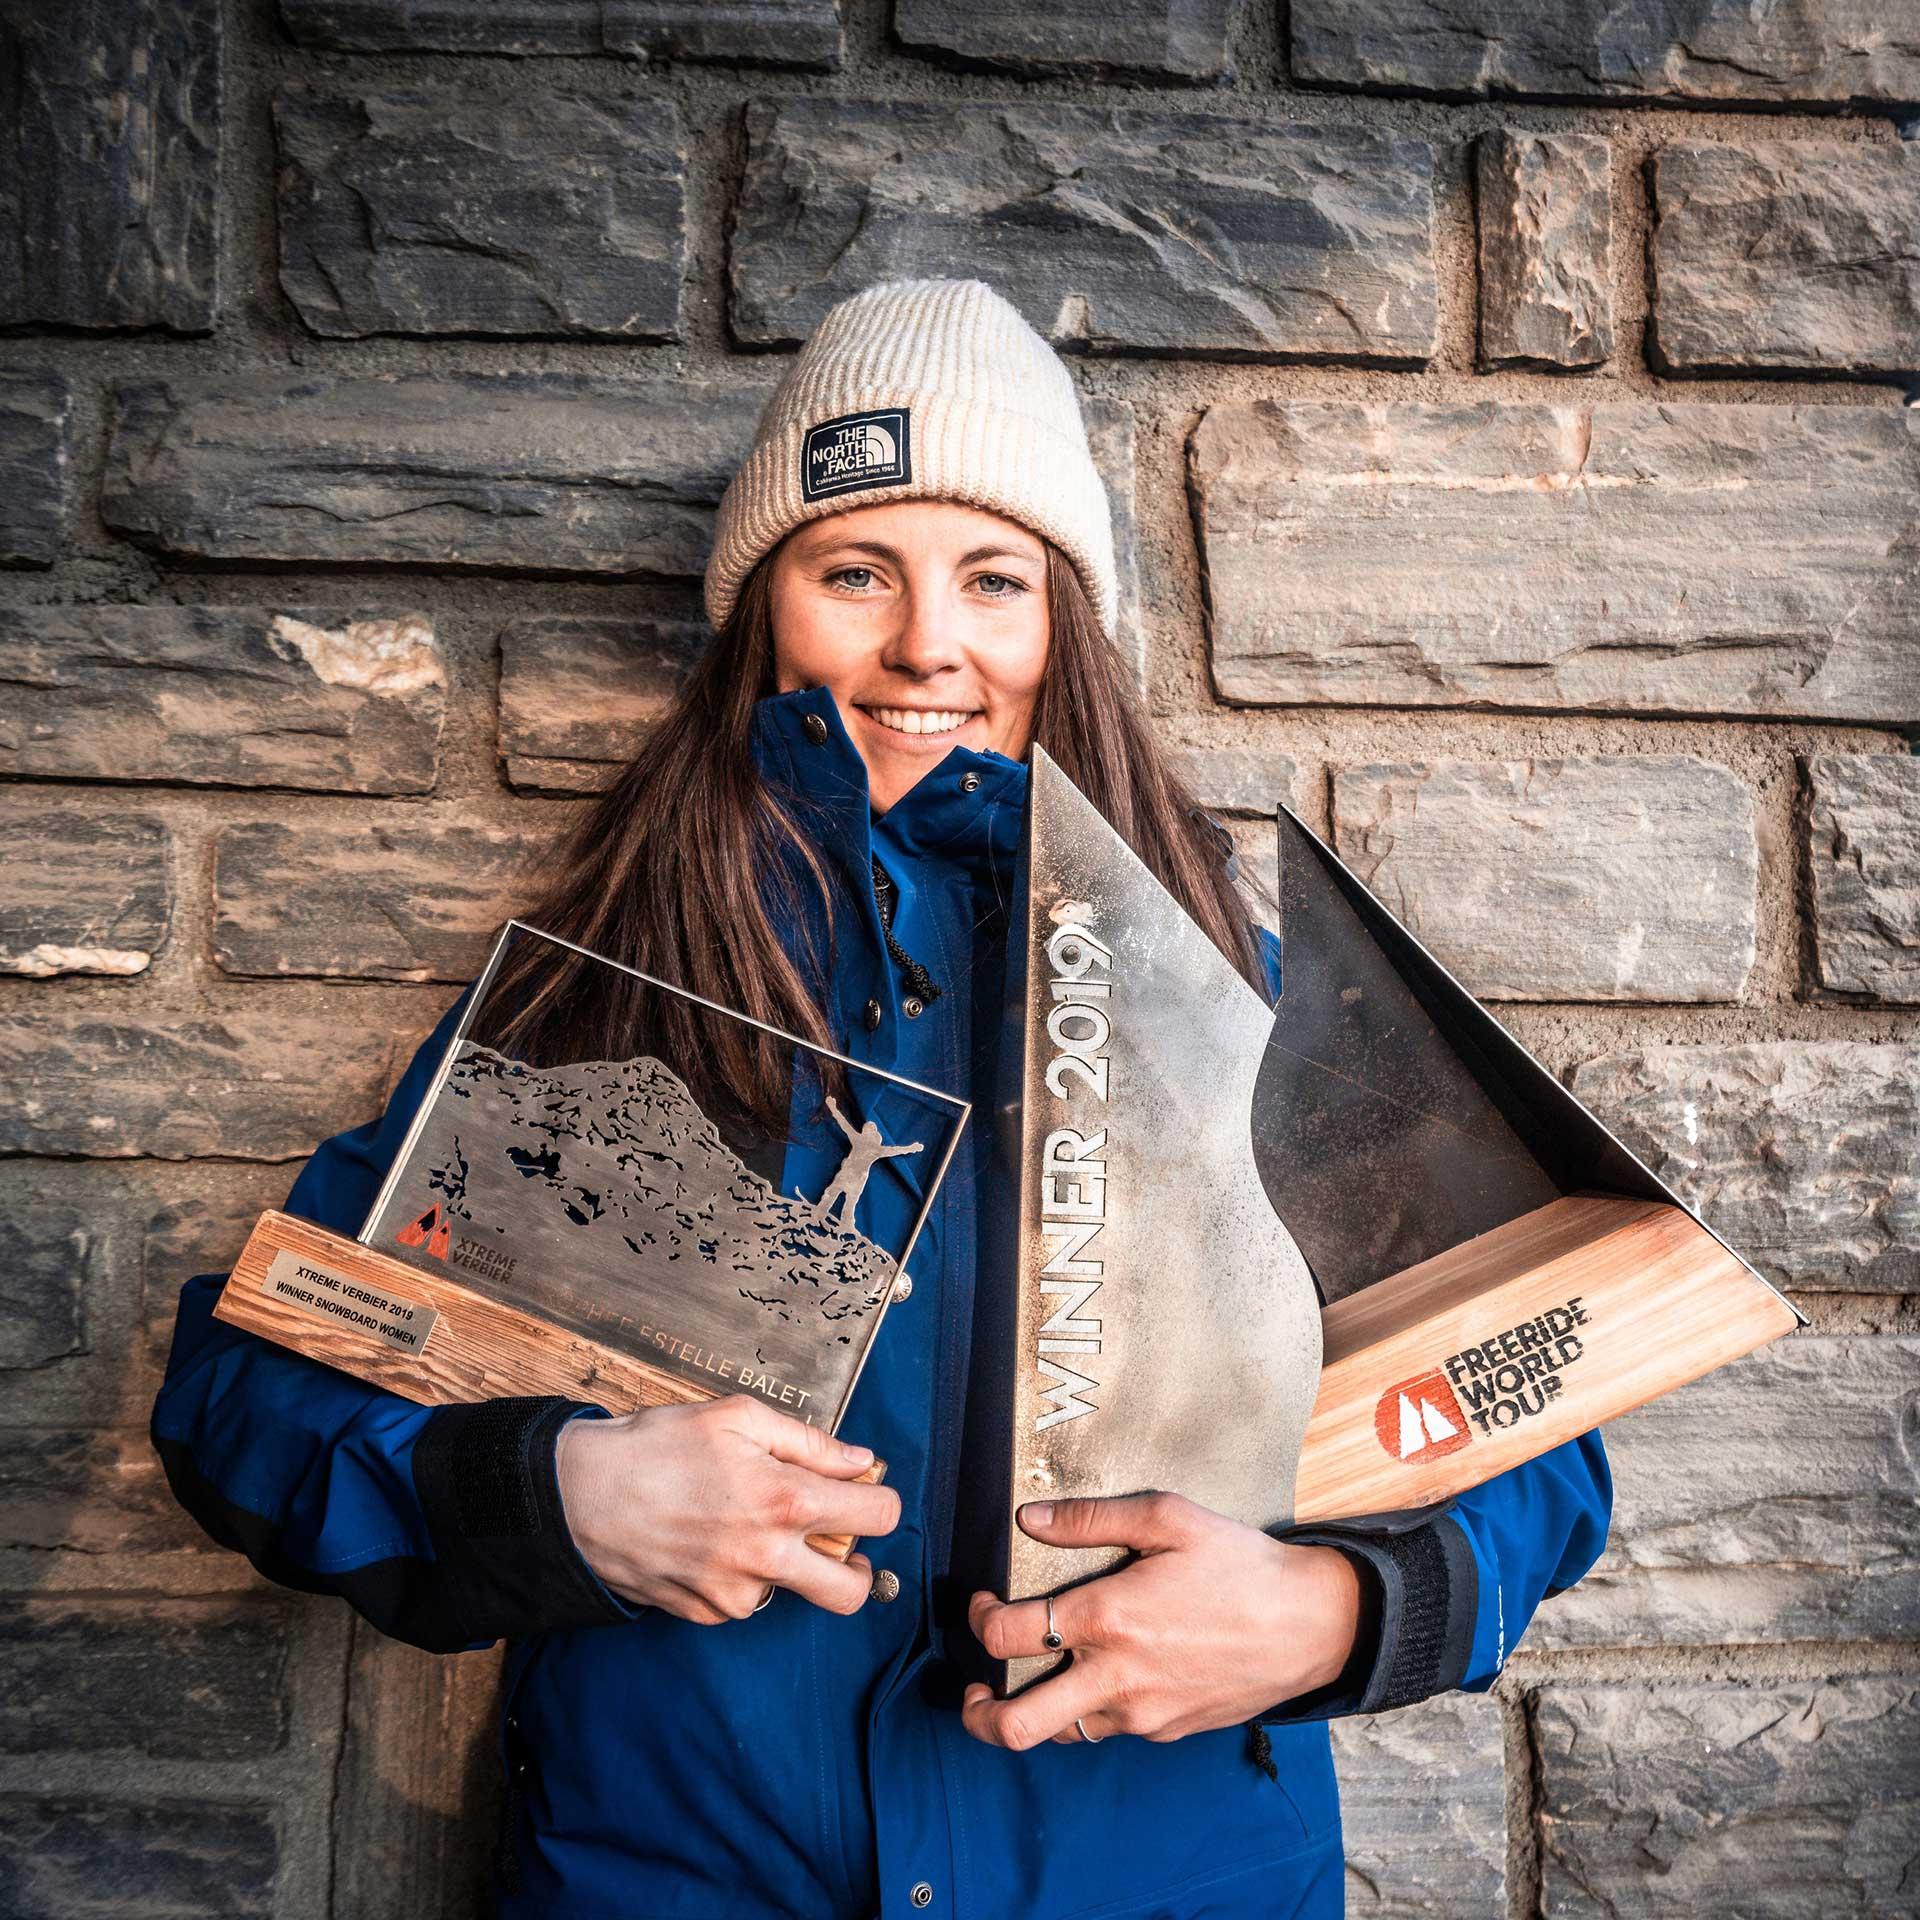 Chamrousse champion marion haerty snowboard freeride championne monde 2017 2019 2020 station montagne ski isère france - © Marion Haerty